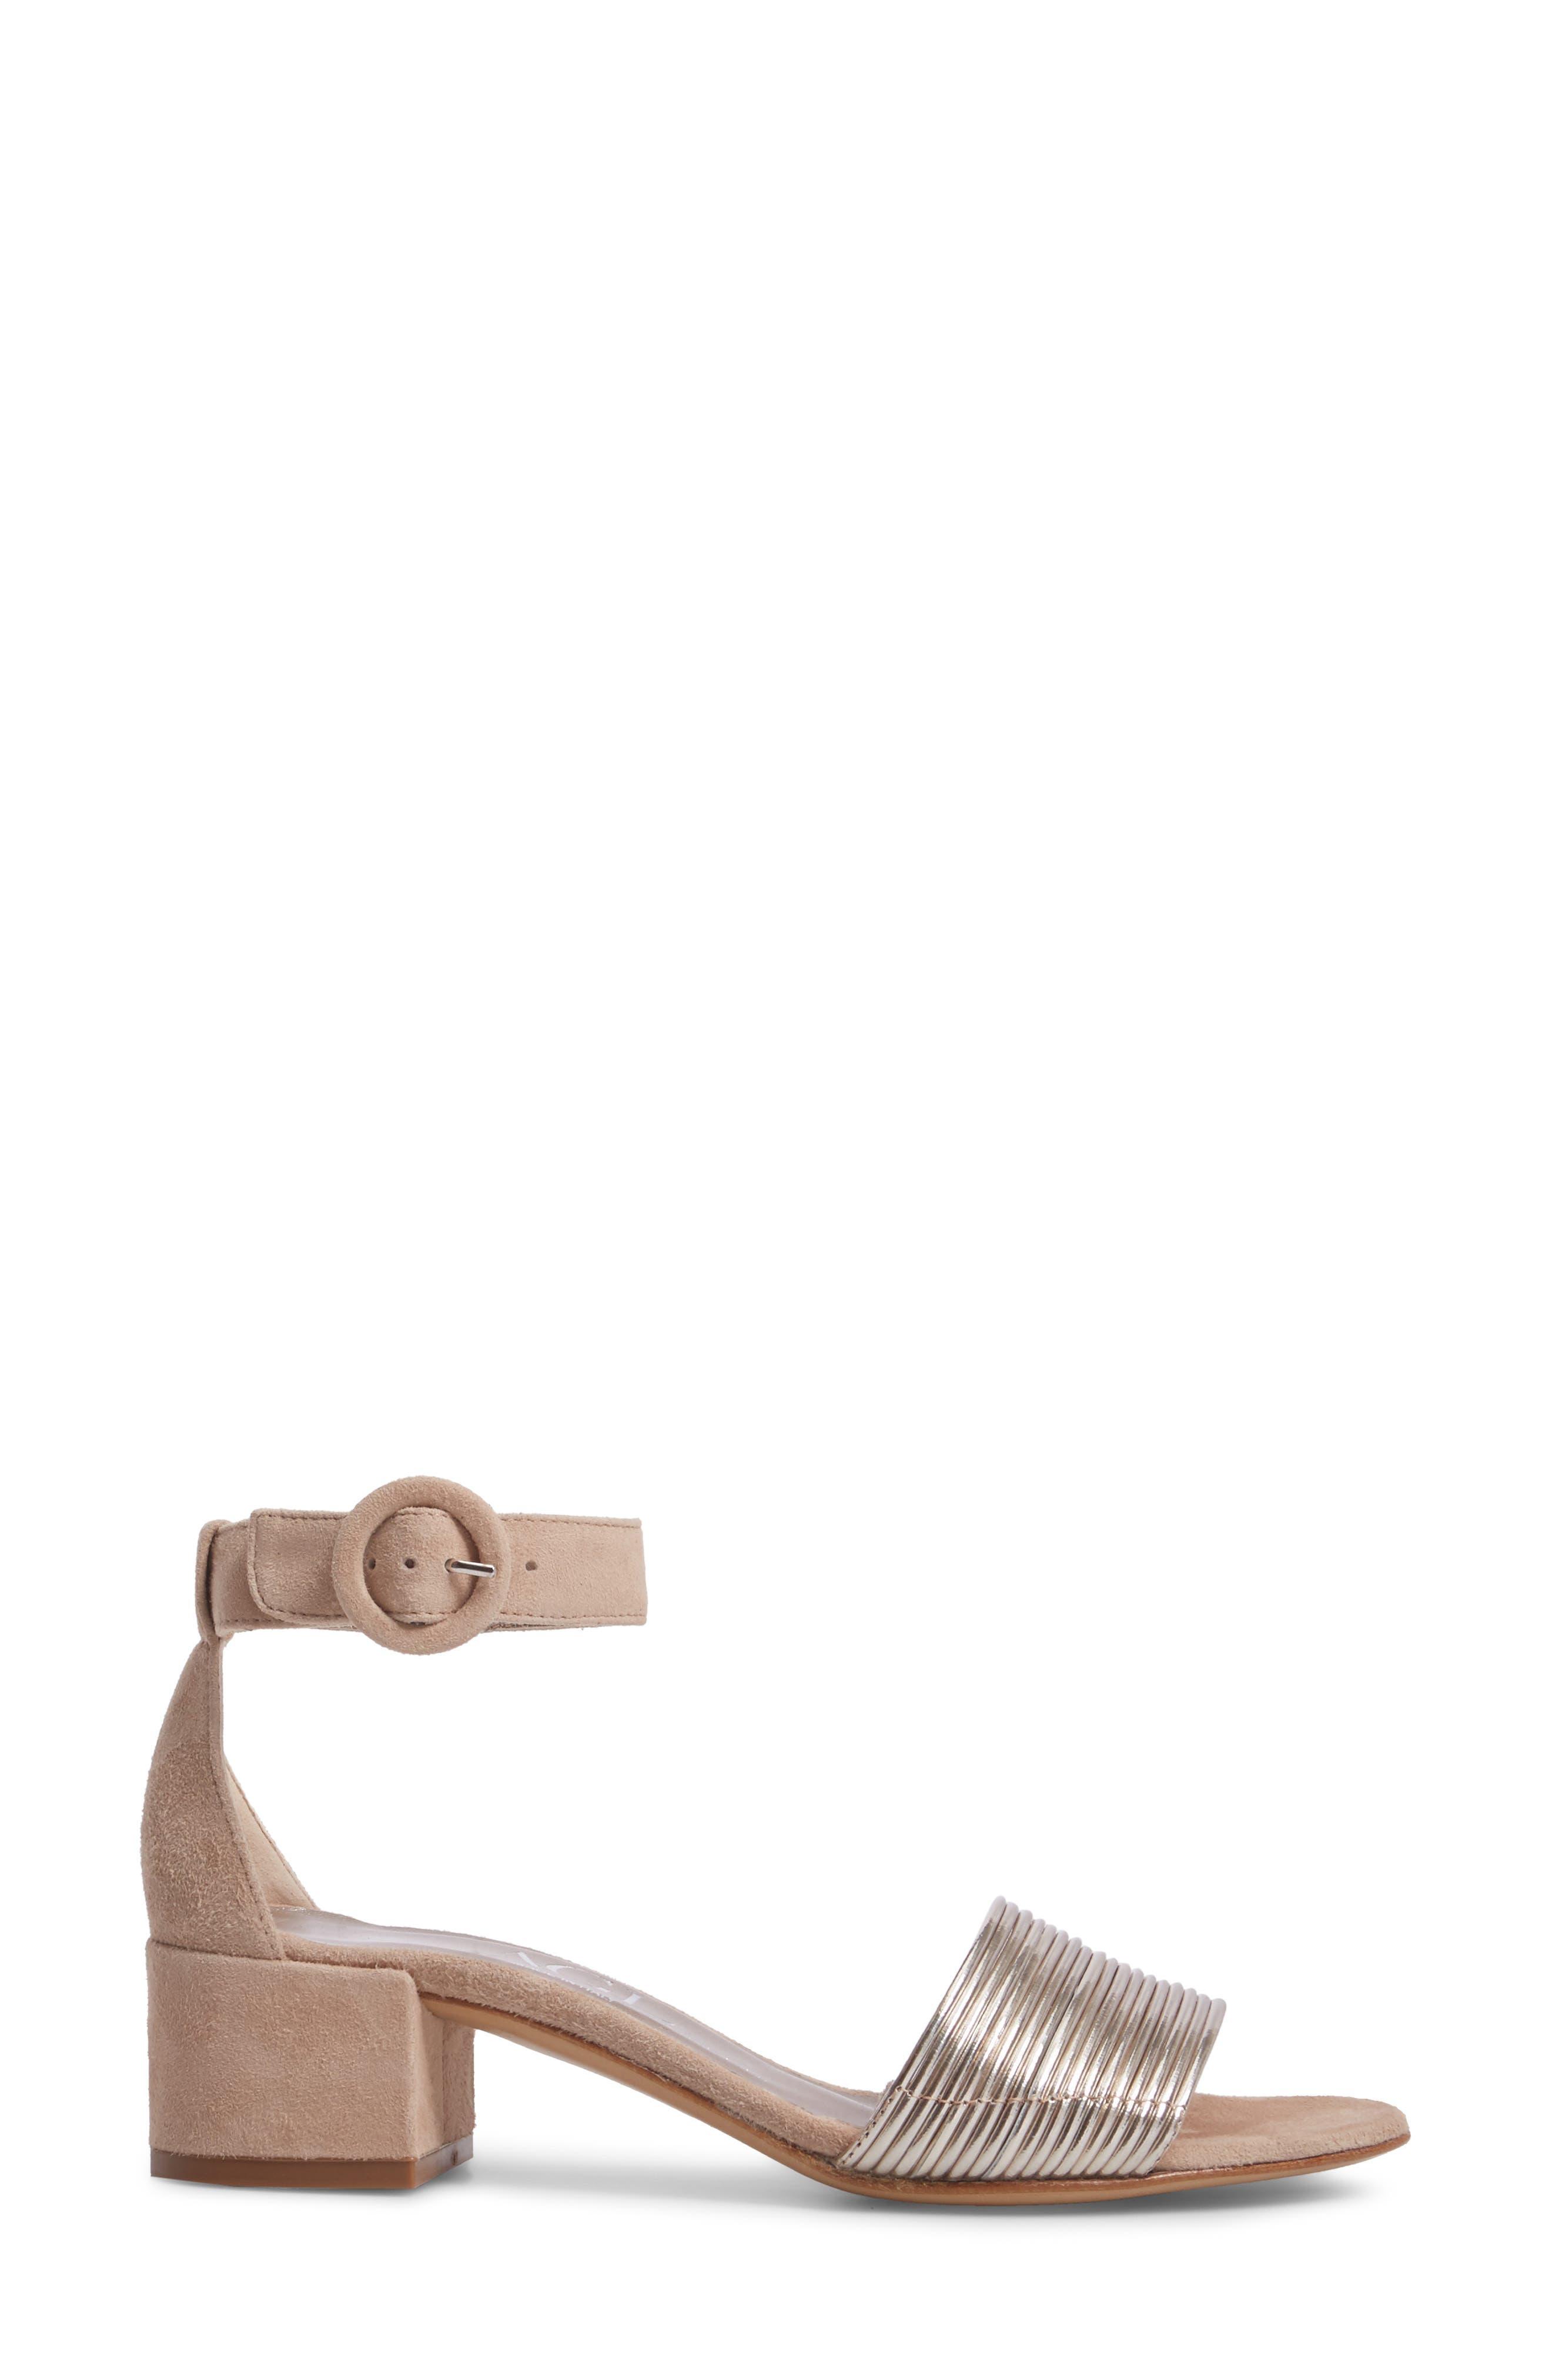 Ankle Strap Sandal,                             Alternate thumbnail 3, color,                             Platinum Leather